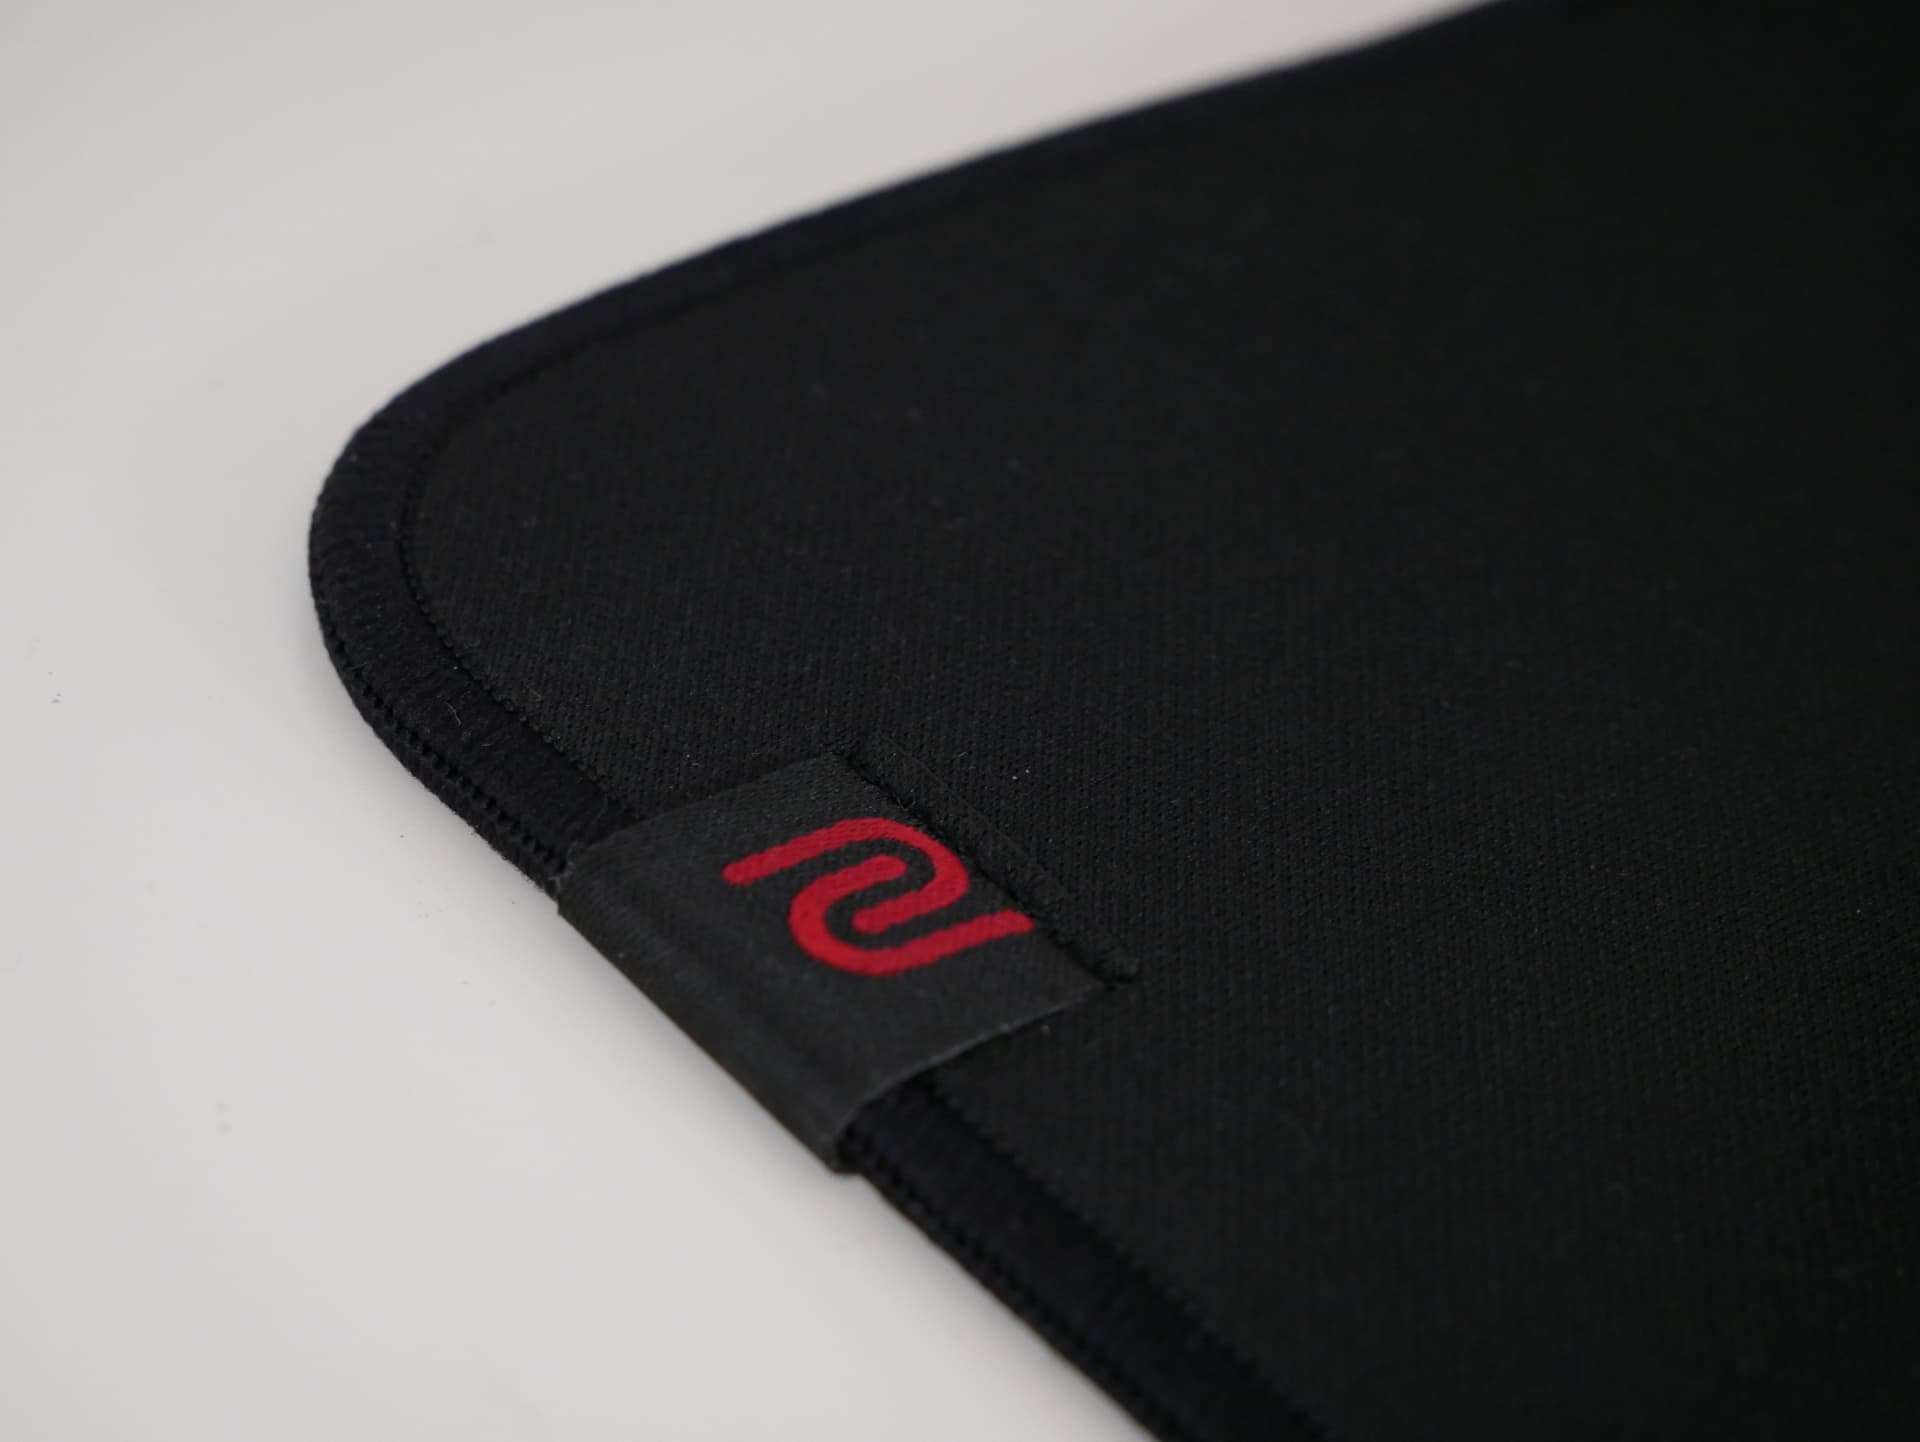 「BenQ ZOWIE G-SR」レビュー。とにかくストッピング性能に優れた布製ゲーミングマウスパッド